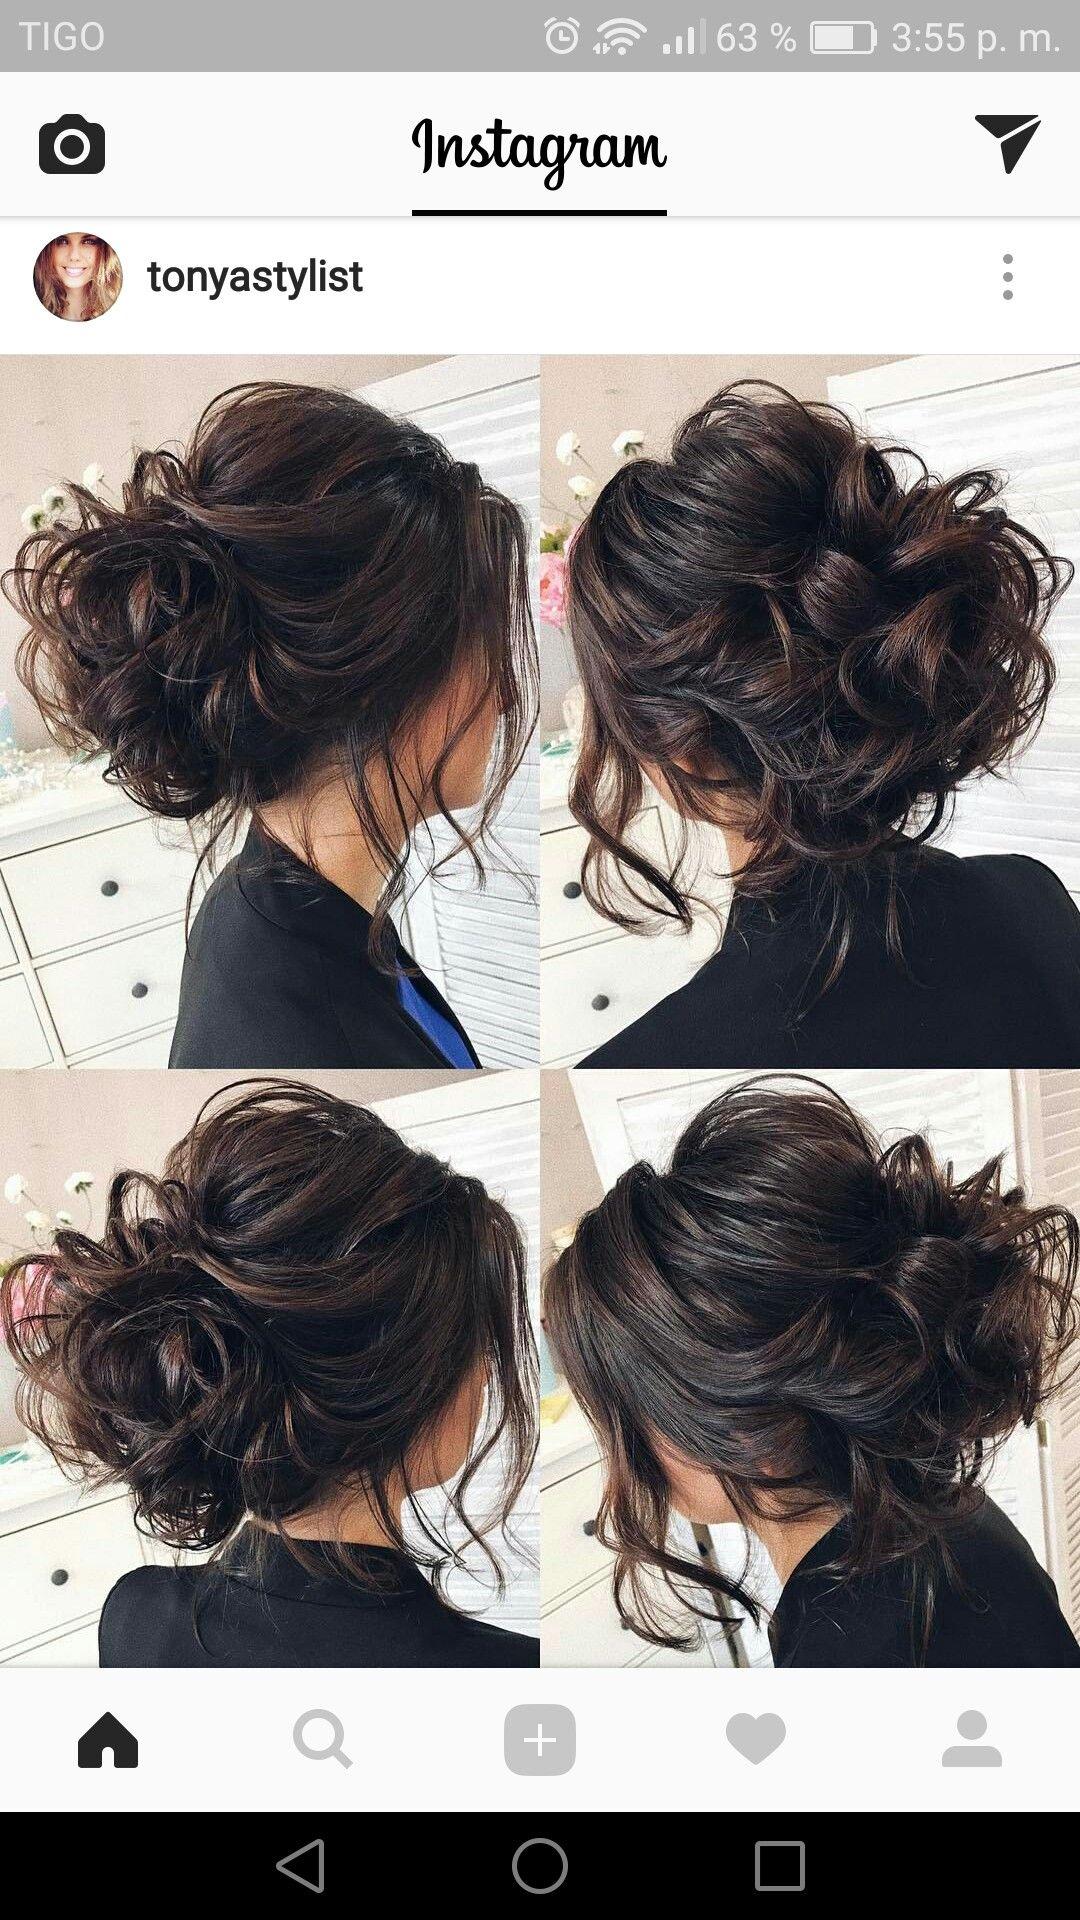 pin by casey fetterolf on wedding | peinados de 15, peinados